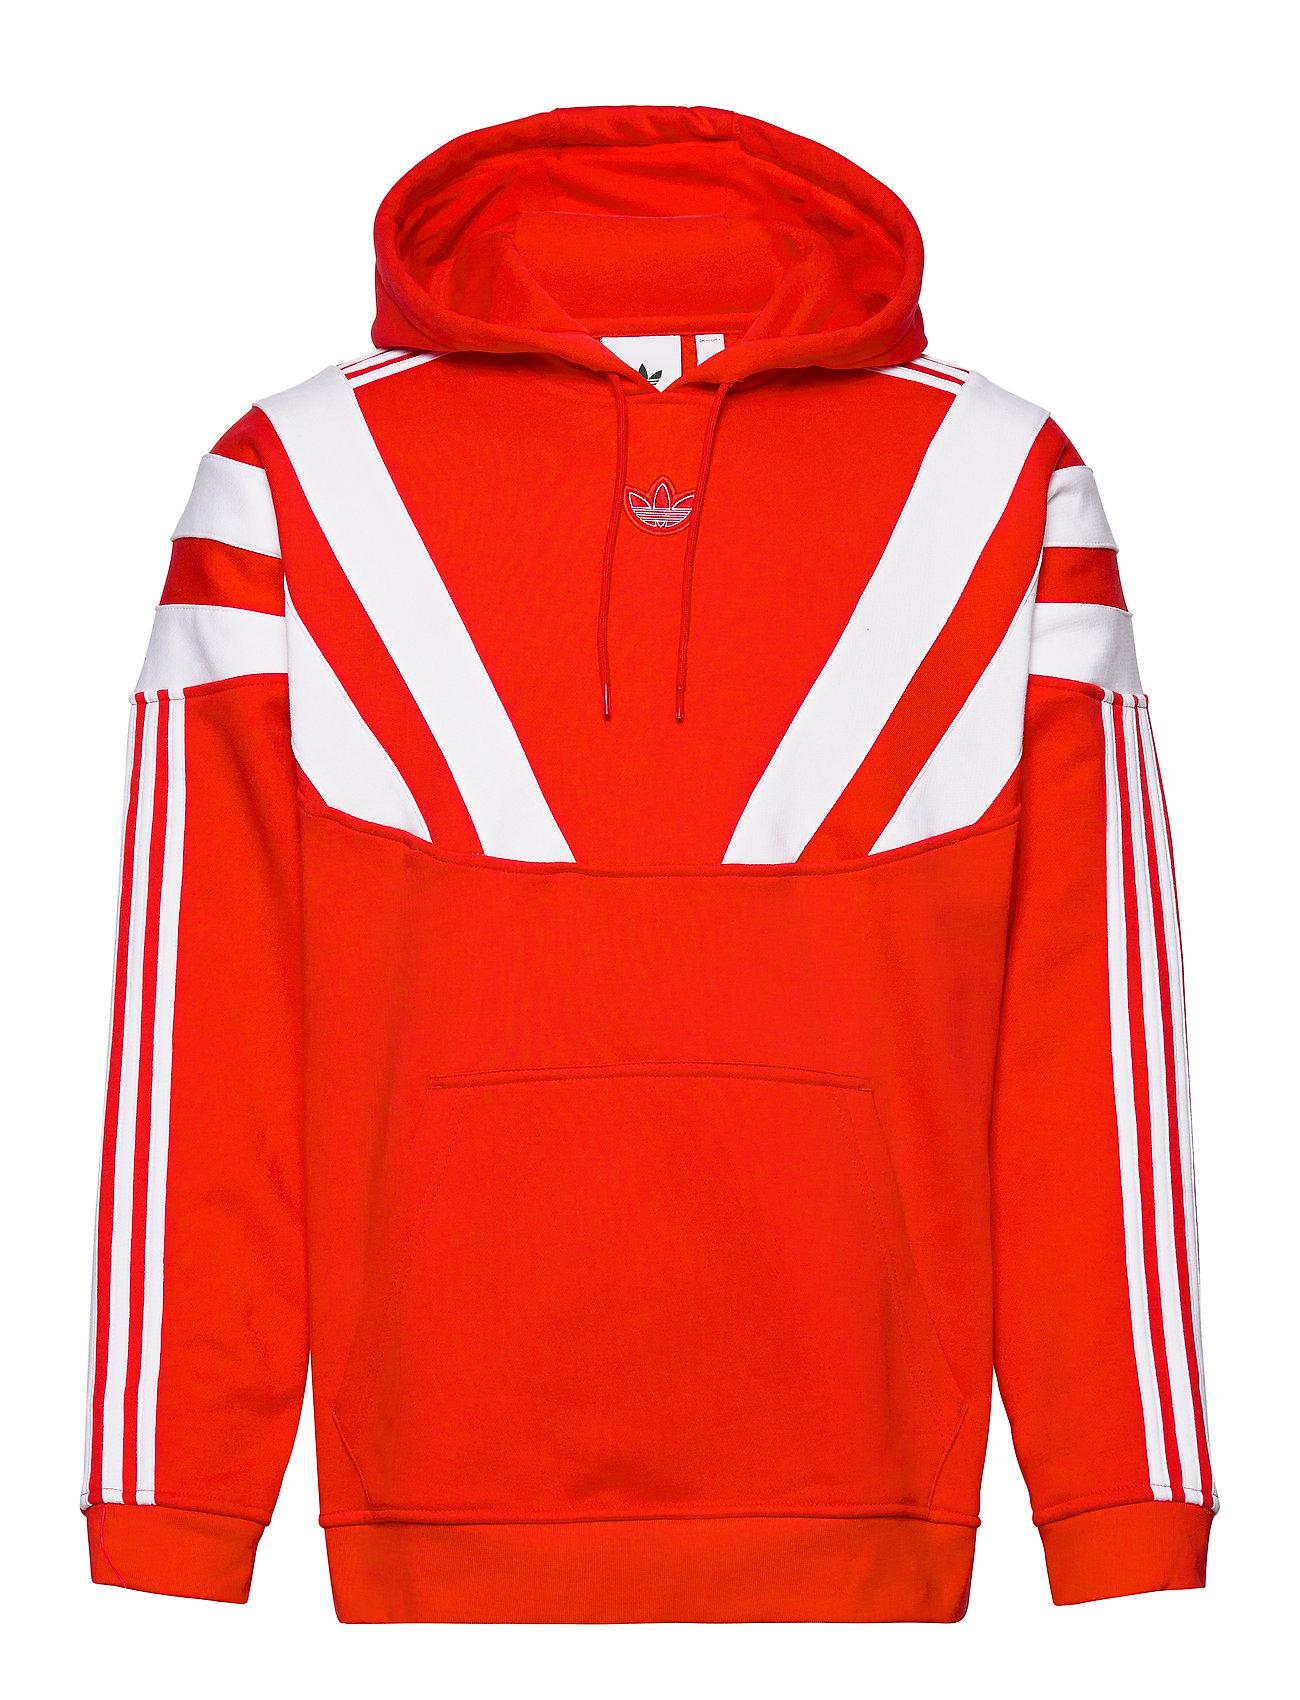 adidas Originals BLNT 96 HOODY - RED